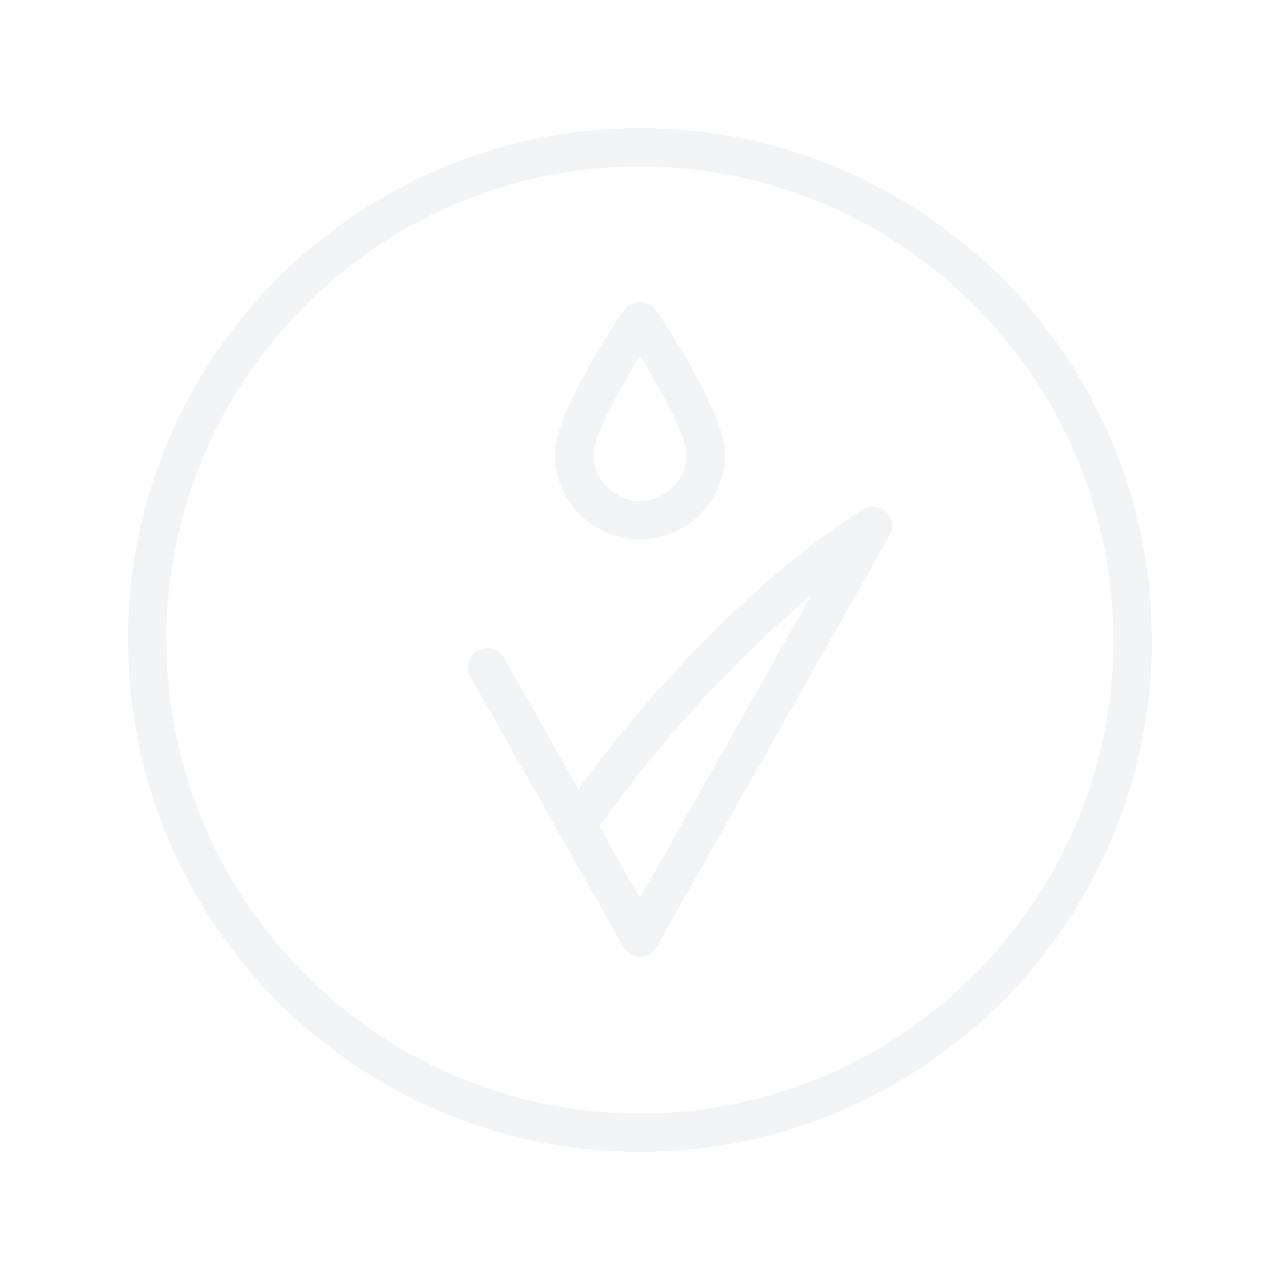 GIORGIO ARMANI Maestro Glow Fusion Makeup SPF30 30ml